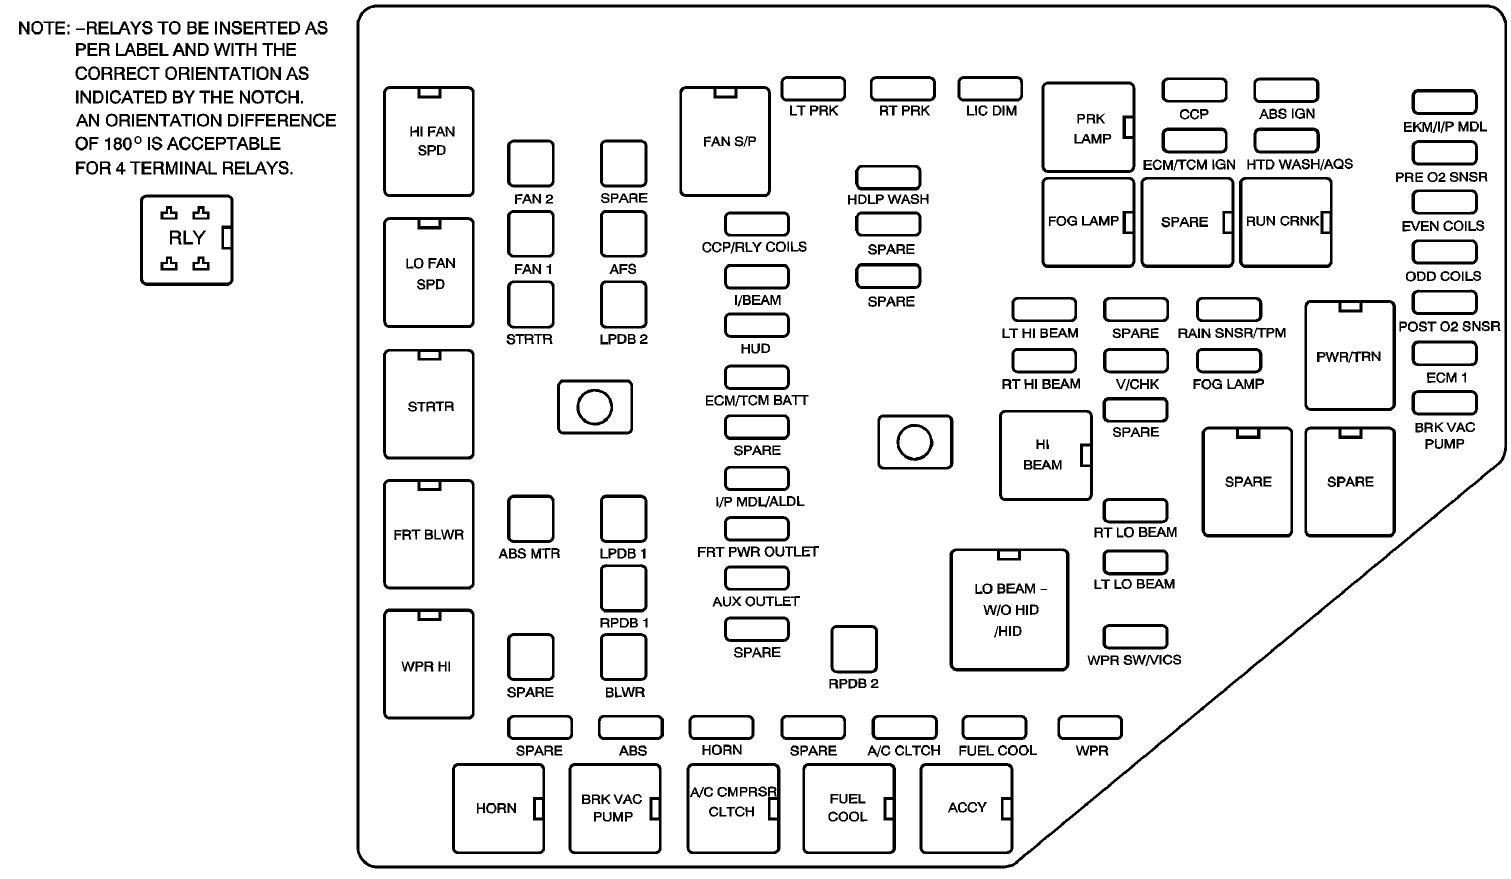 2008 Acadia Fuse Box Diagram